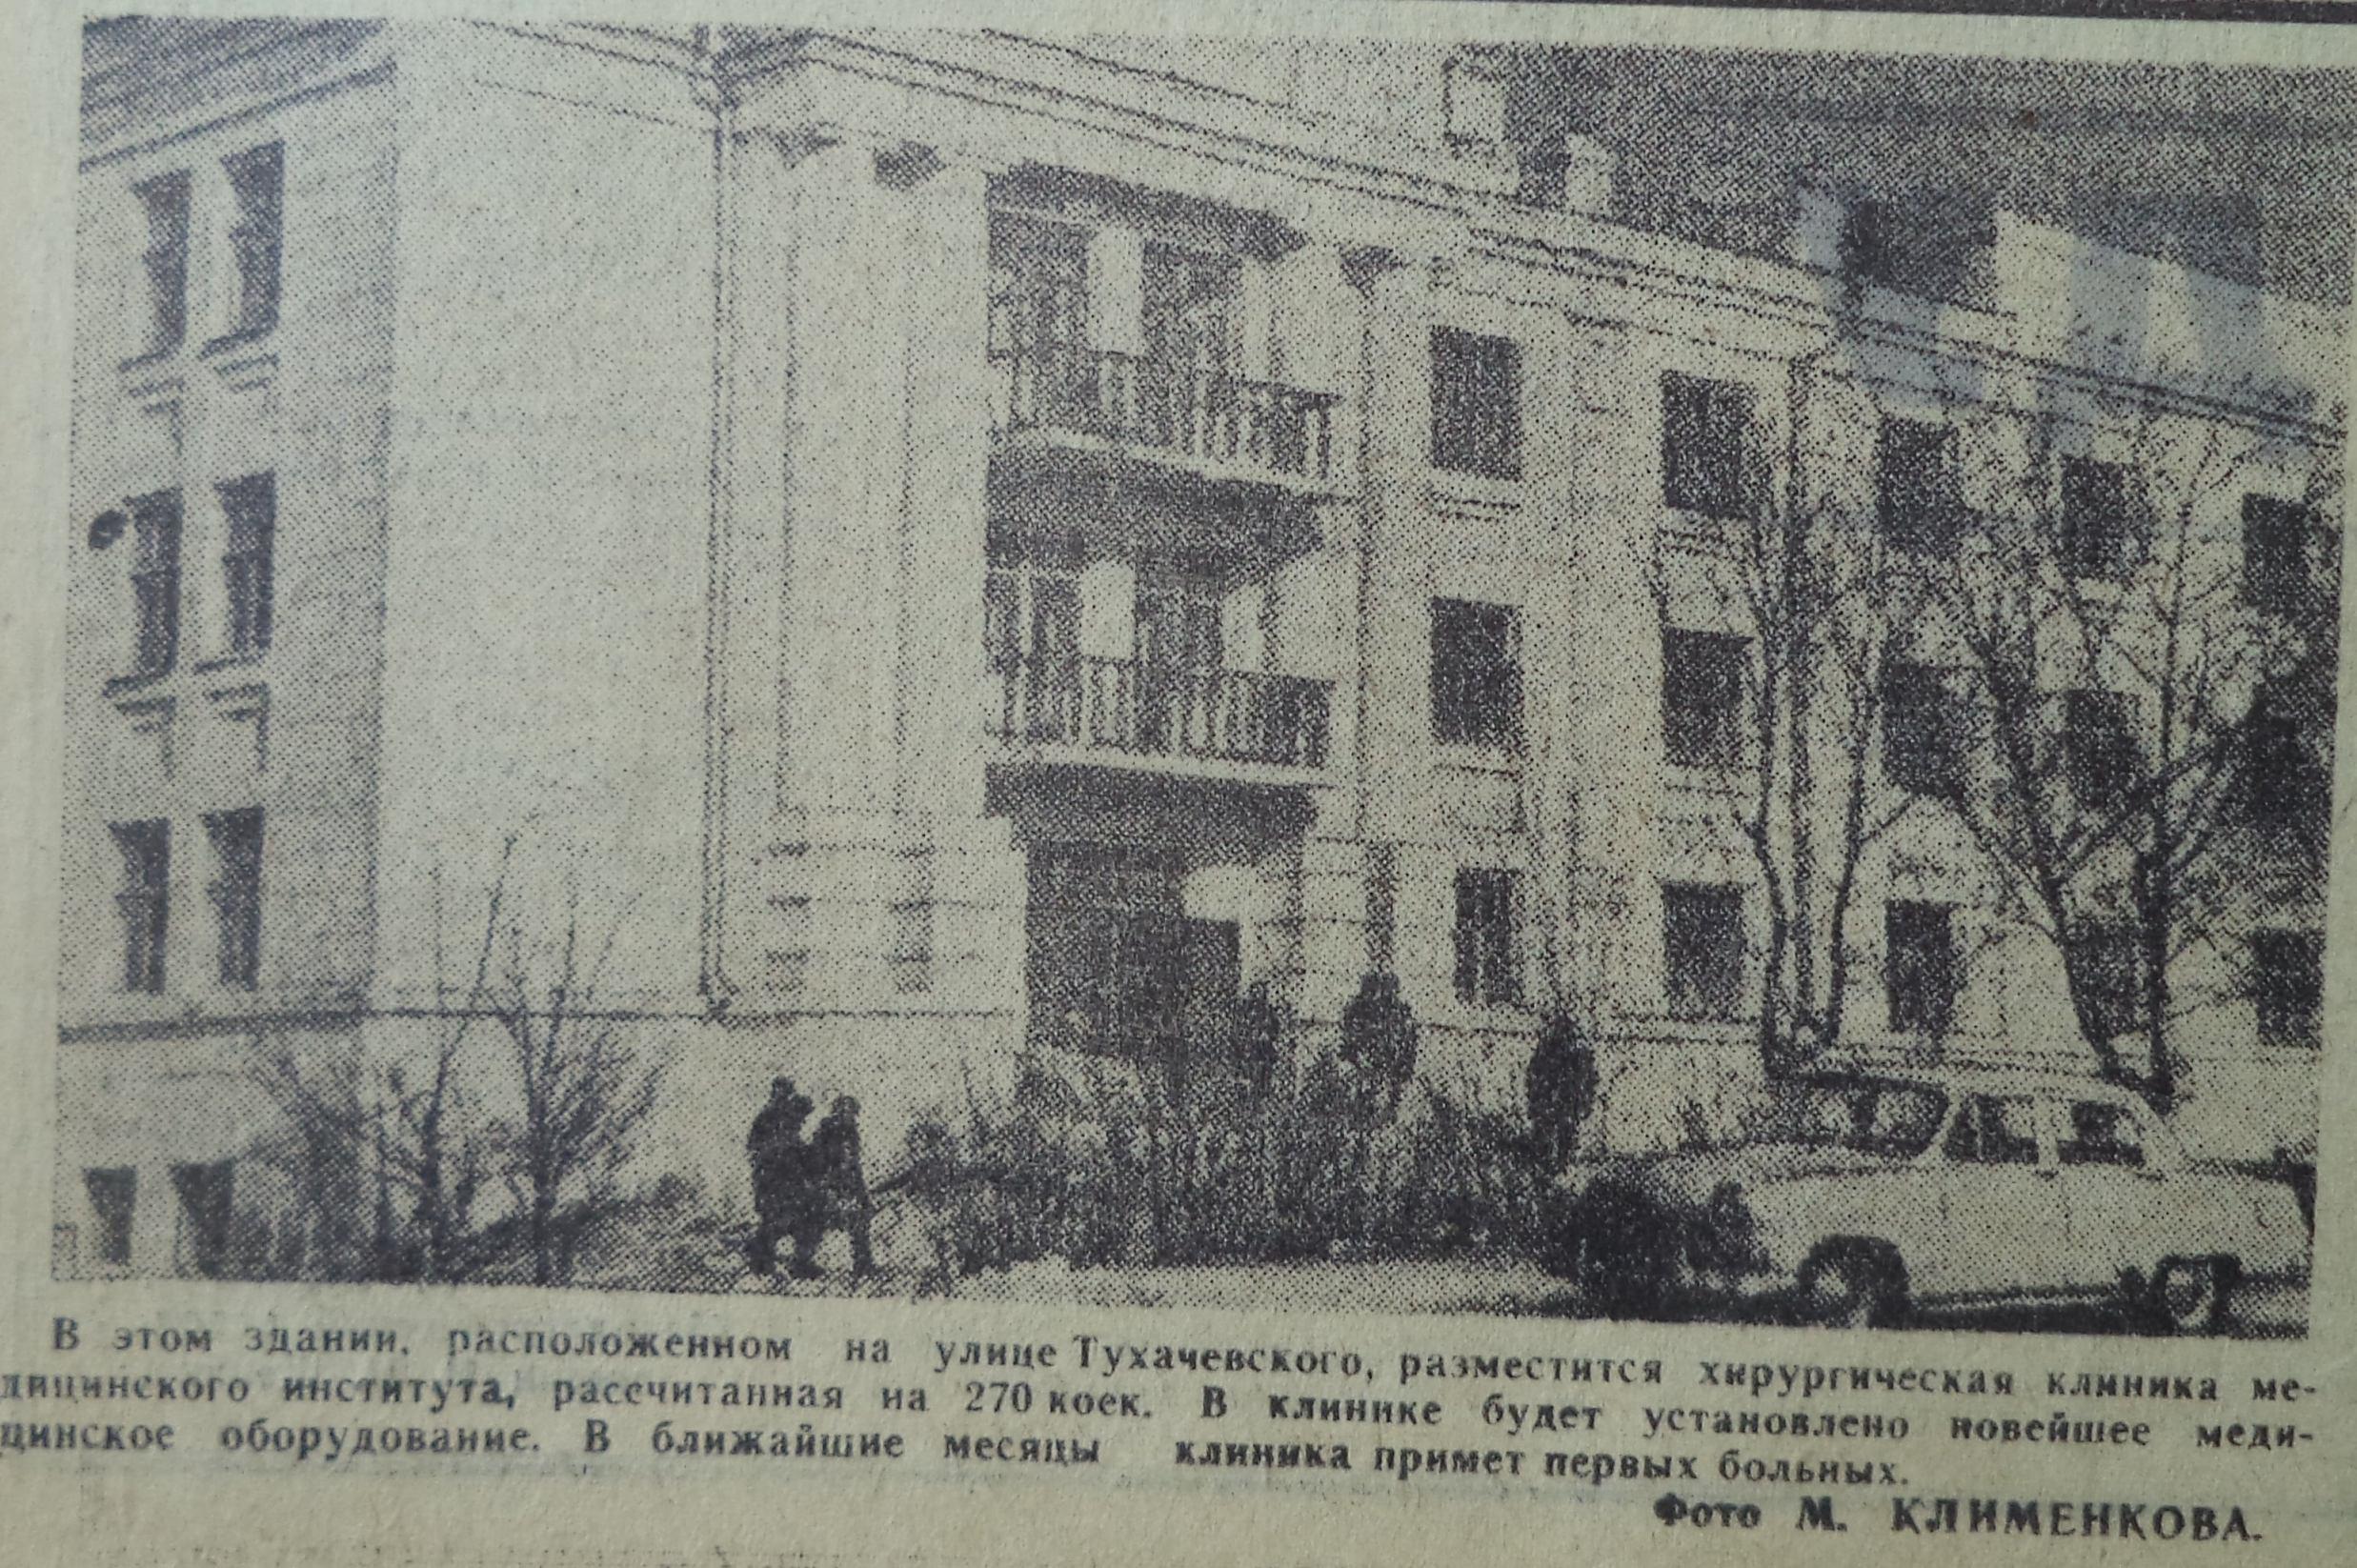 Тухачевского-ФОТО-11-ВЗя-1969-03-21-фото клиники на Тух